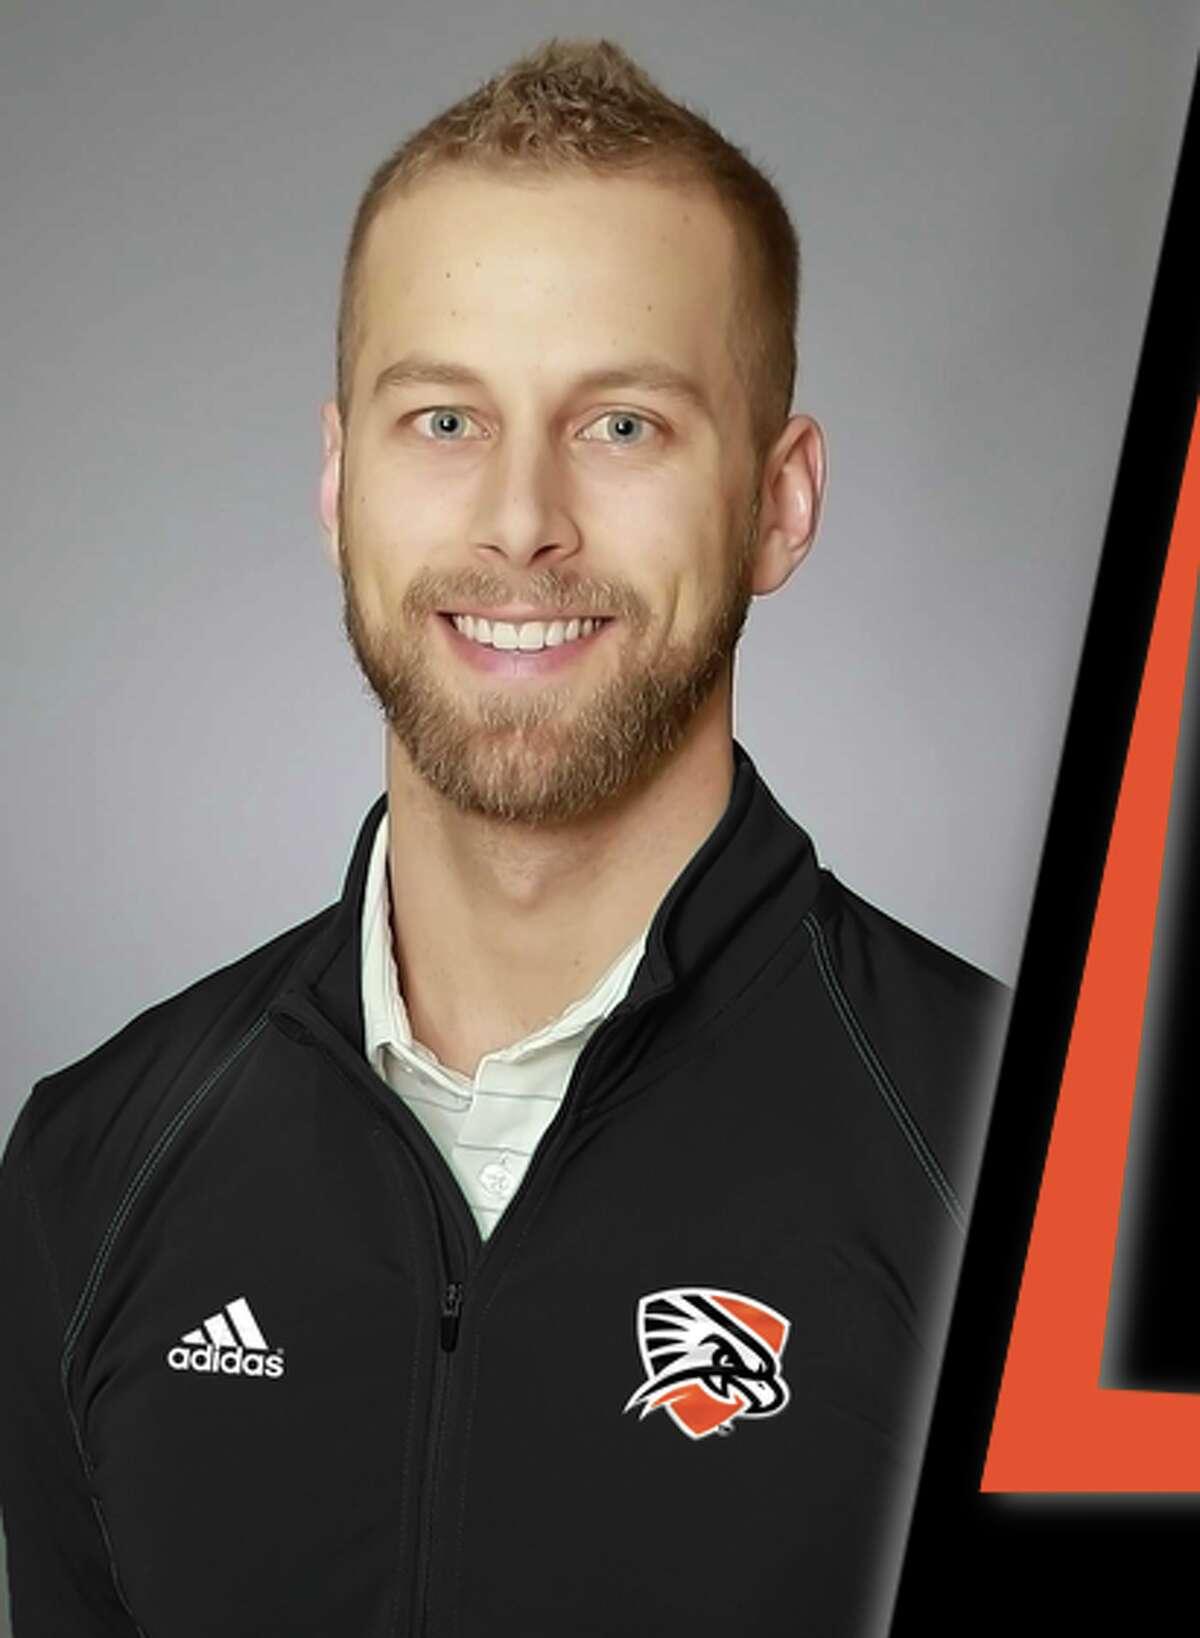 UTPBgolf coach Kyle Wittenbach